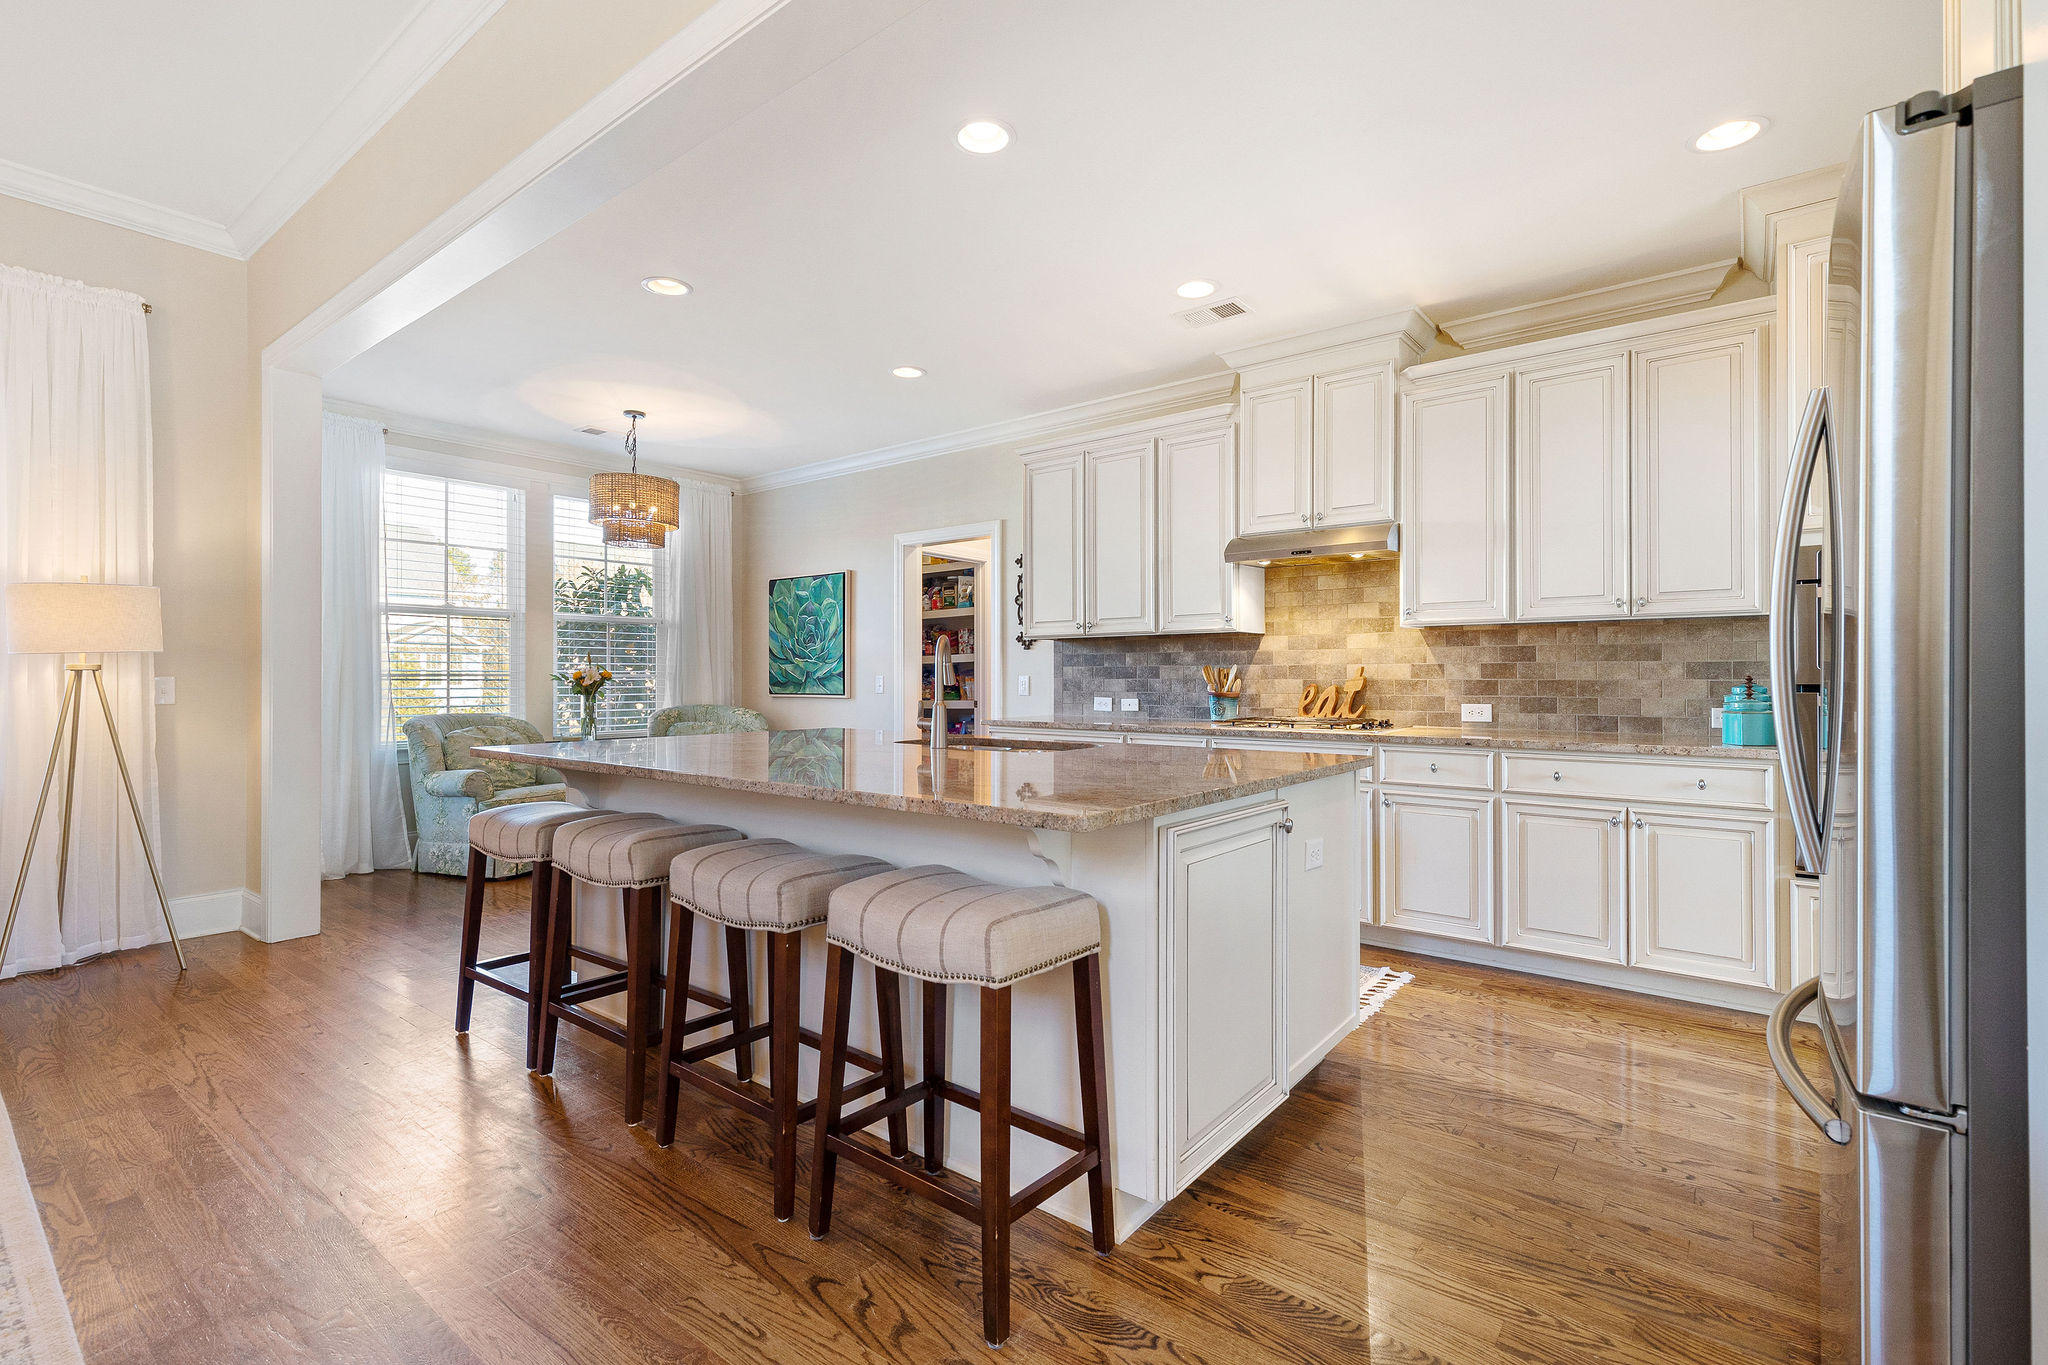 Dunes West Homes For Sale - 3212 Hatchway, Mount Pleasant, SC - 38